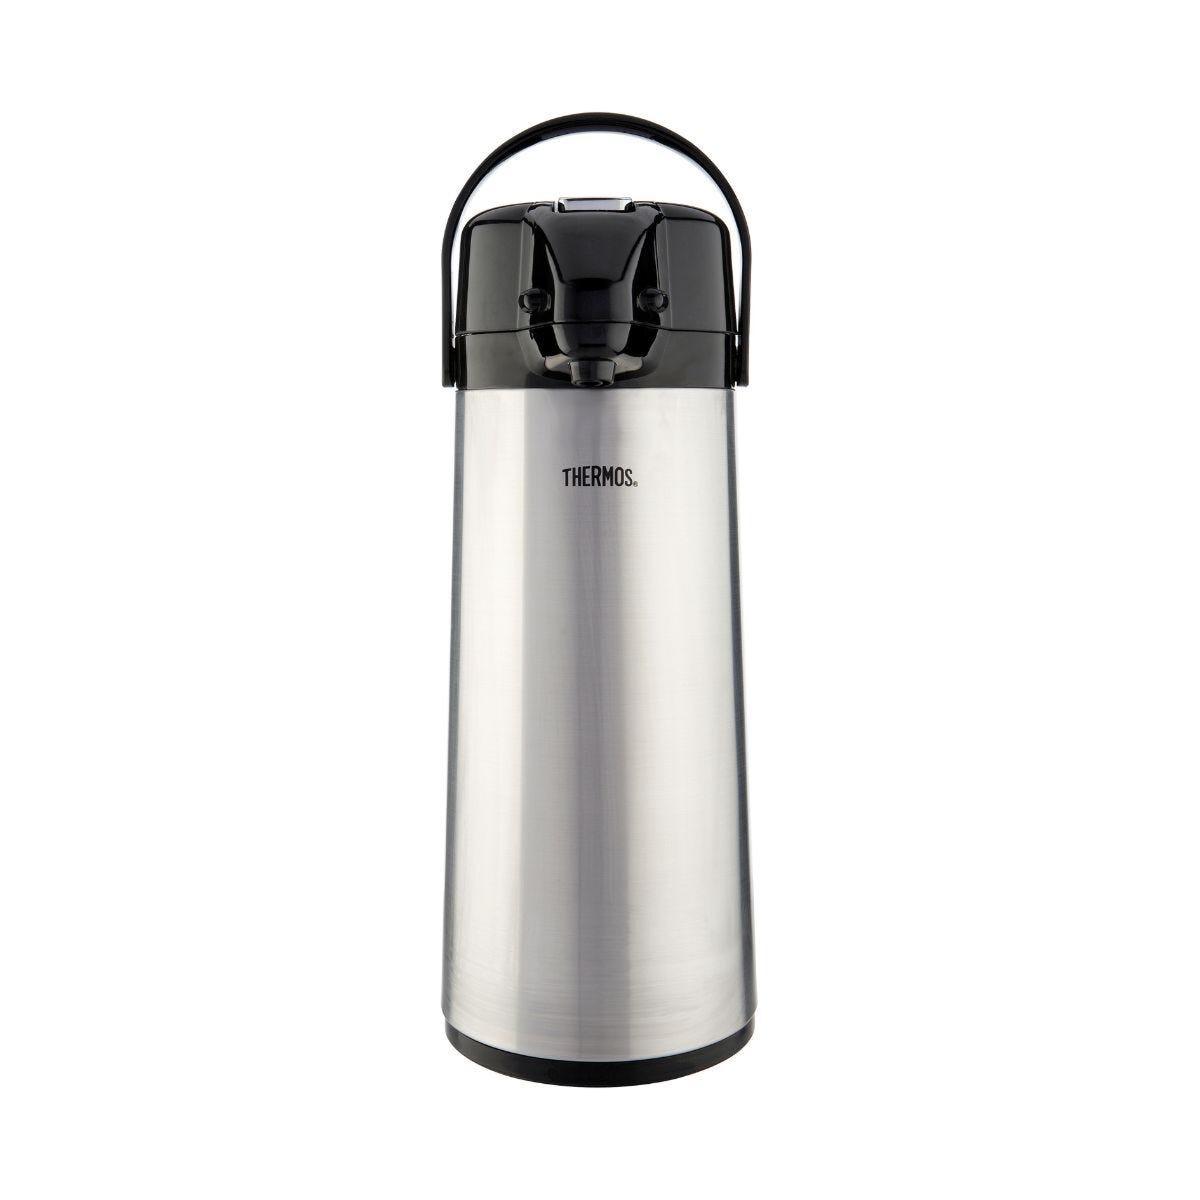 Thermos Lever Action Pump Pot Drinks Dispenser 2.5L